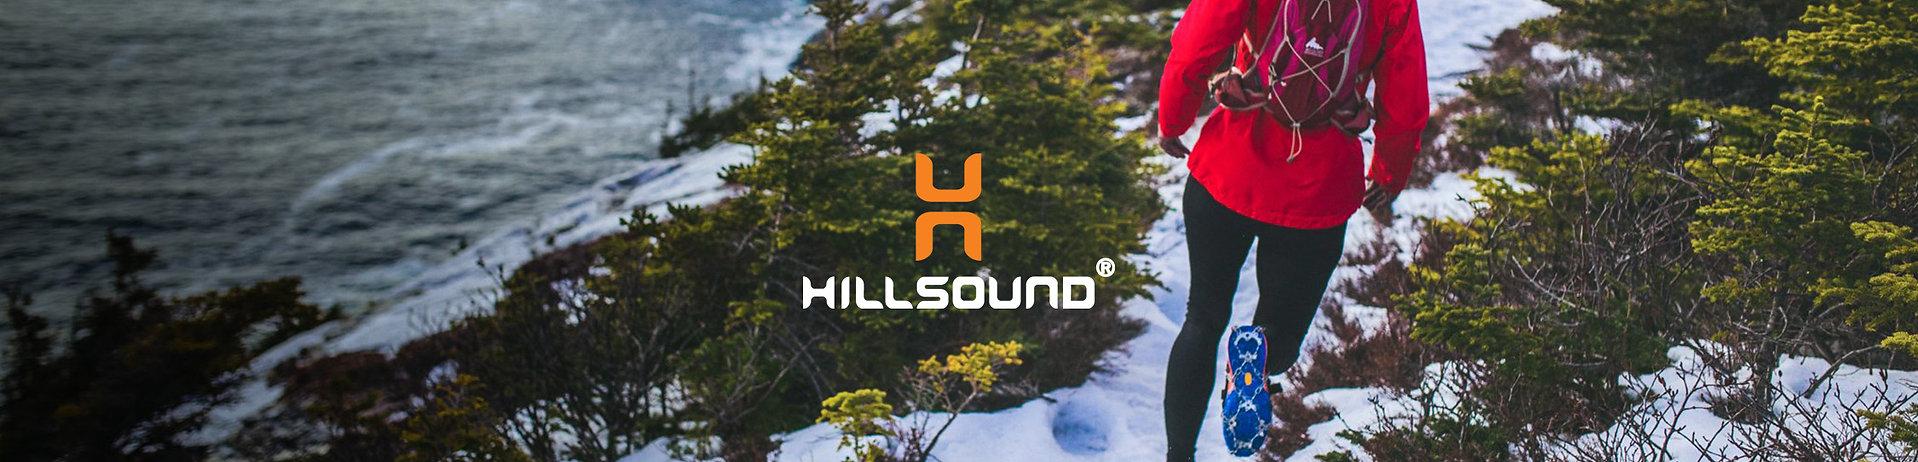 hillsound-banner.jpg